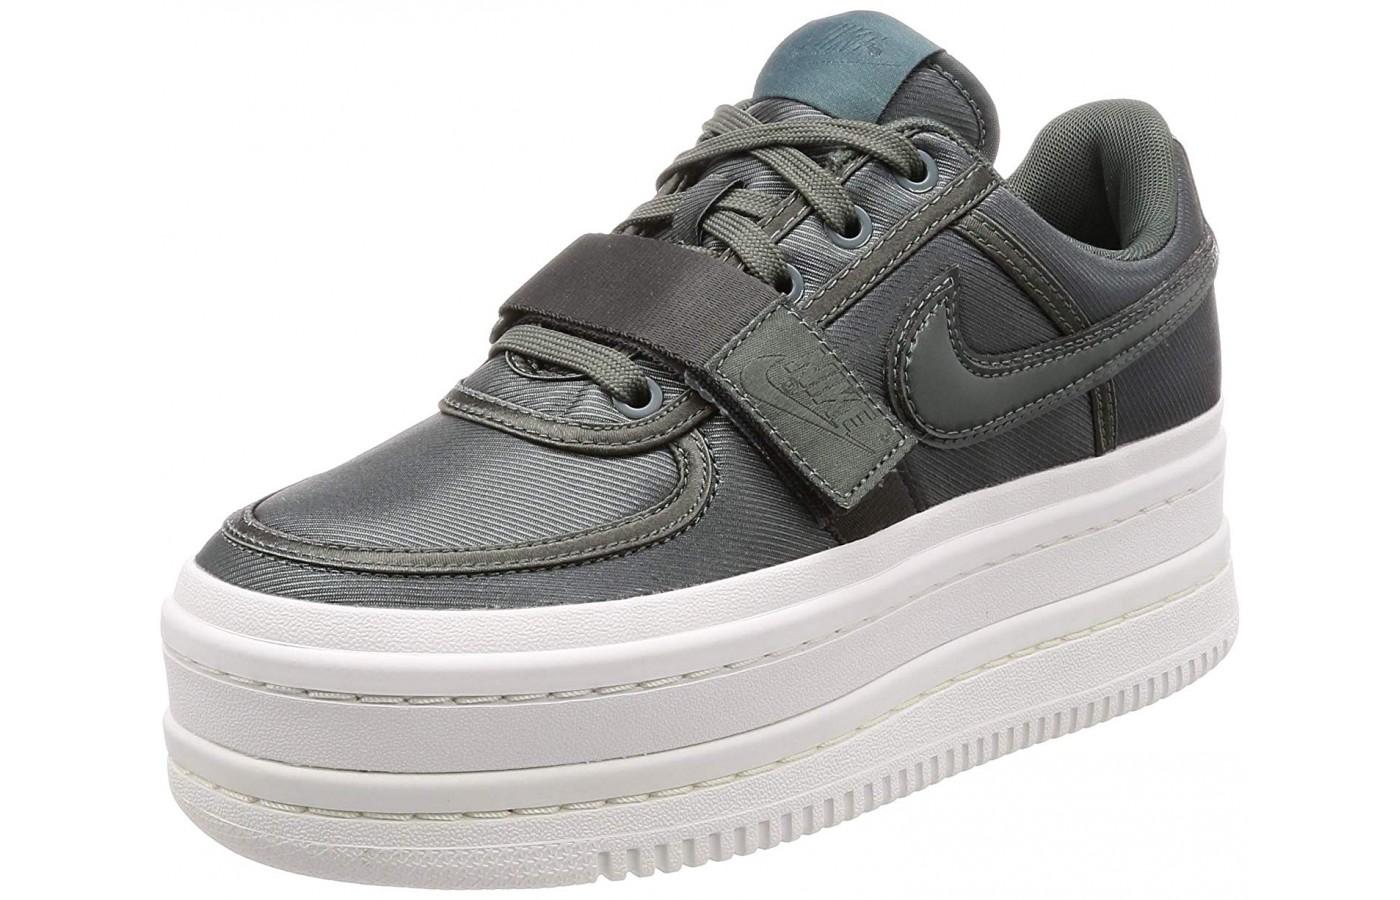 Nike Vandal 2k Angled